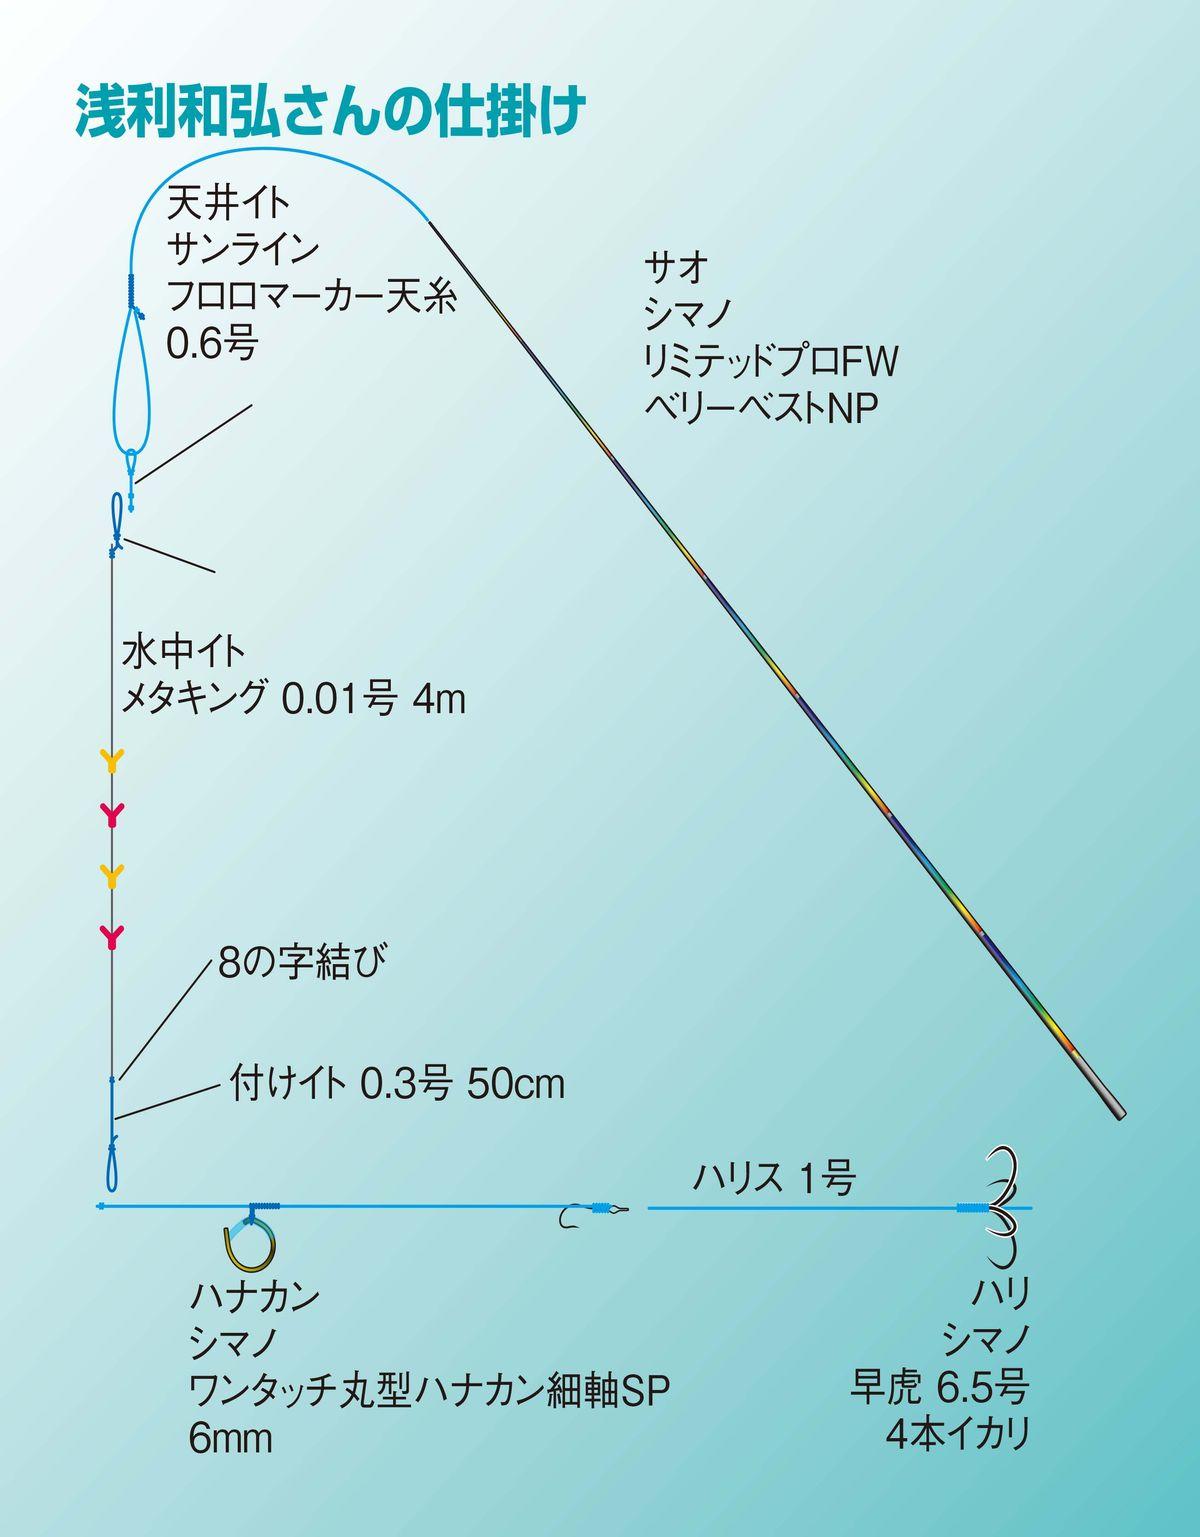 028-031kozagawa-metaking_cs6 (1)